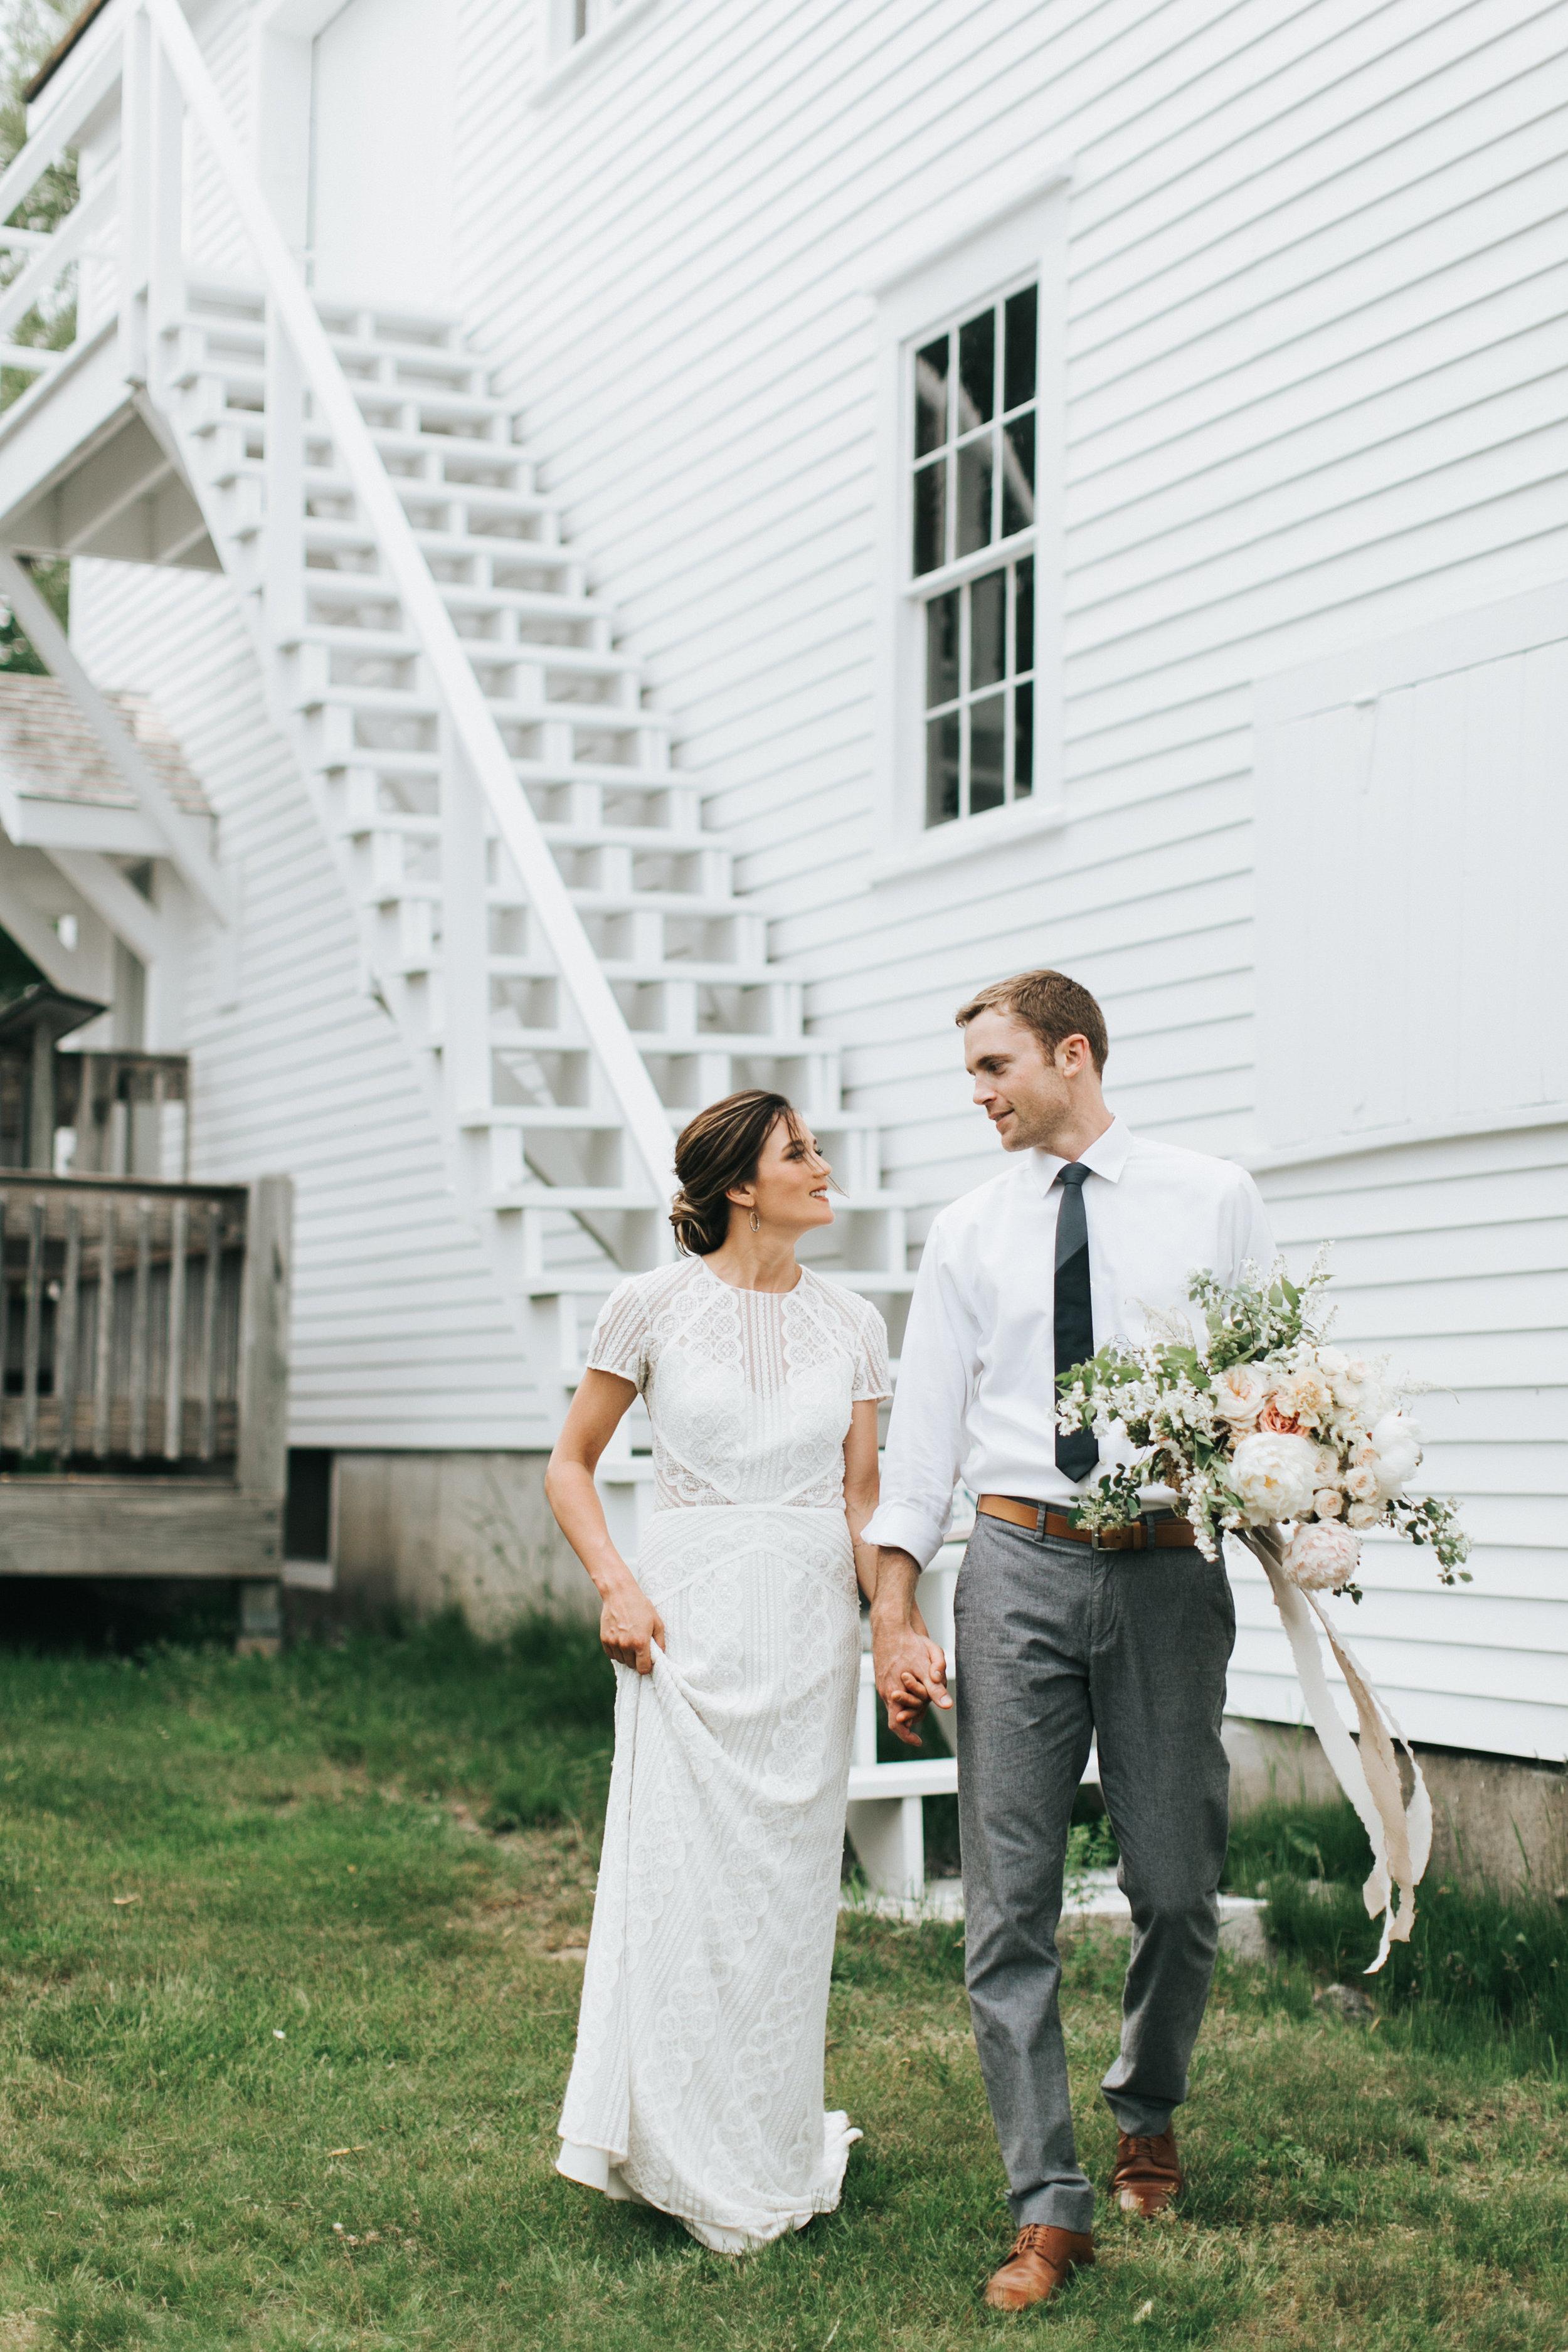 Watershed-Floral-Maine-Maritime-Wedding-Bridal-Bouquet-Centerpieces-0233.jpg